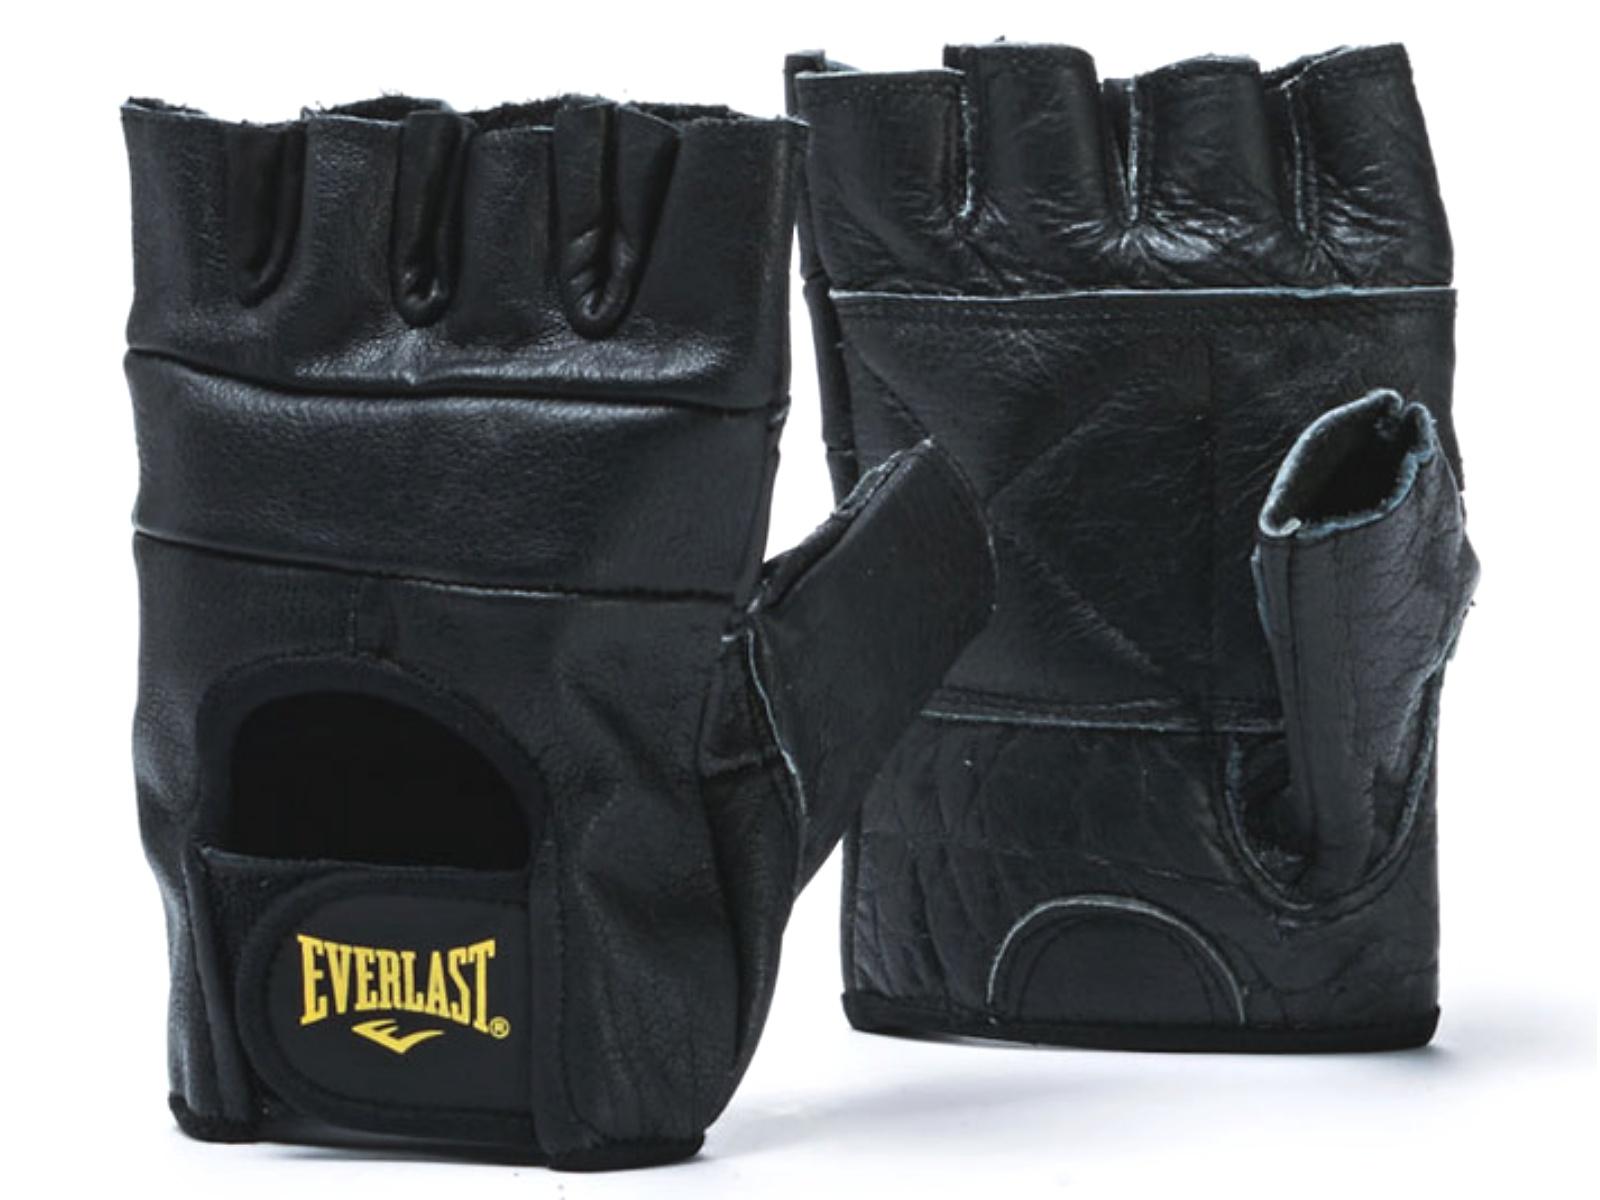 Kožené rukavice do posilovny EVERLAST - vel. M